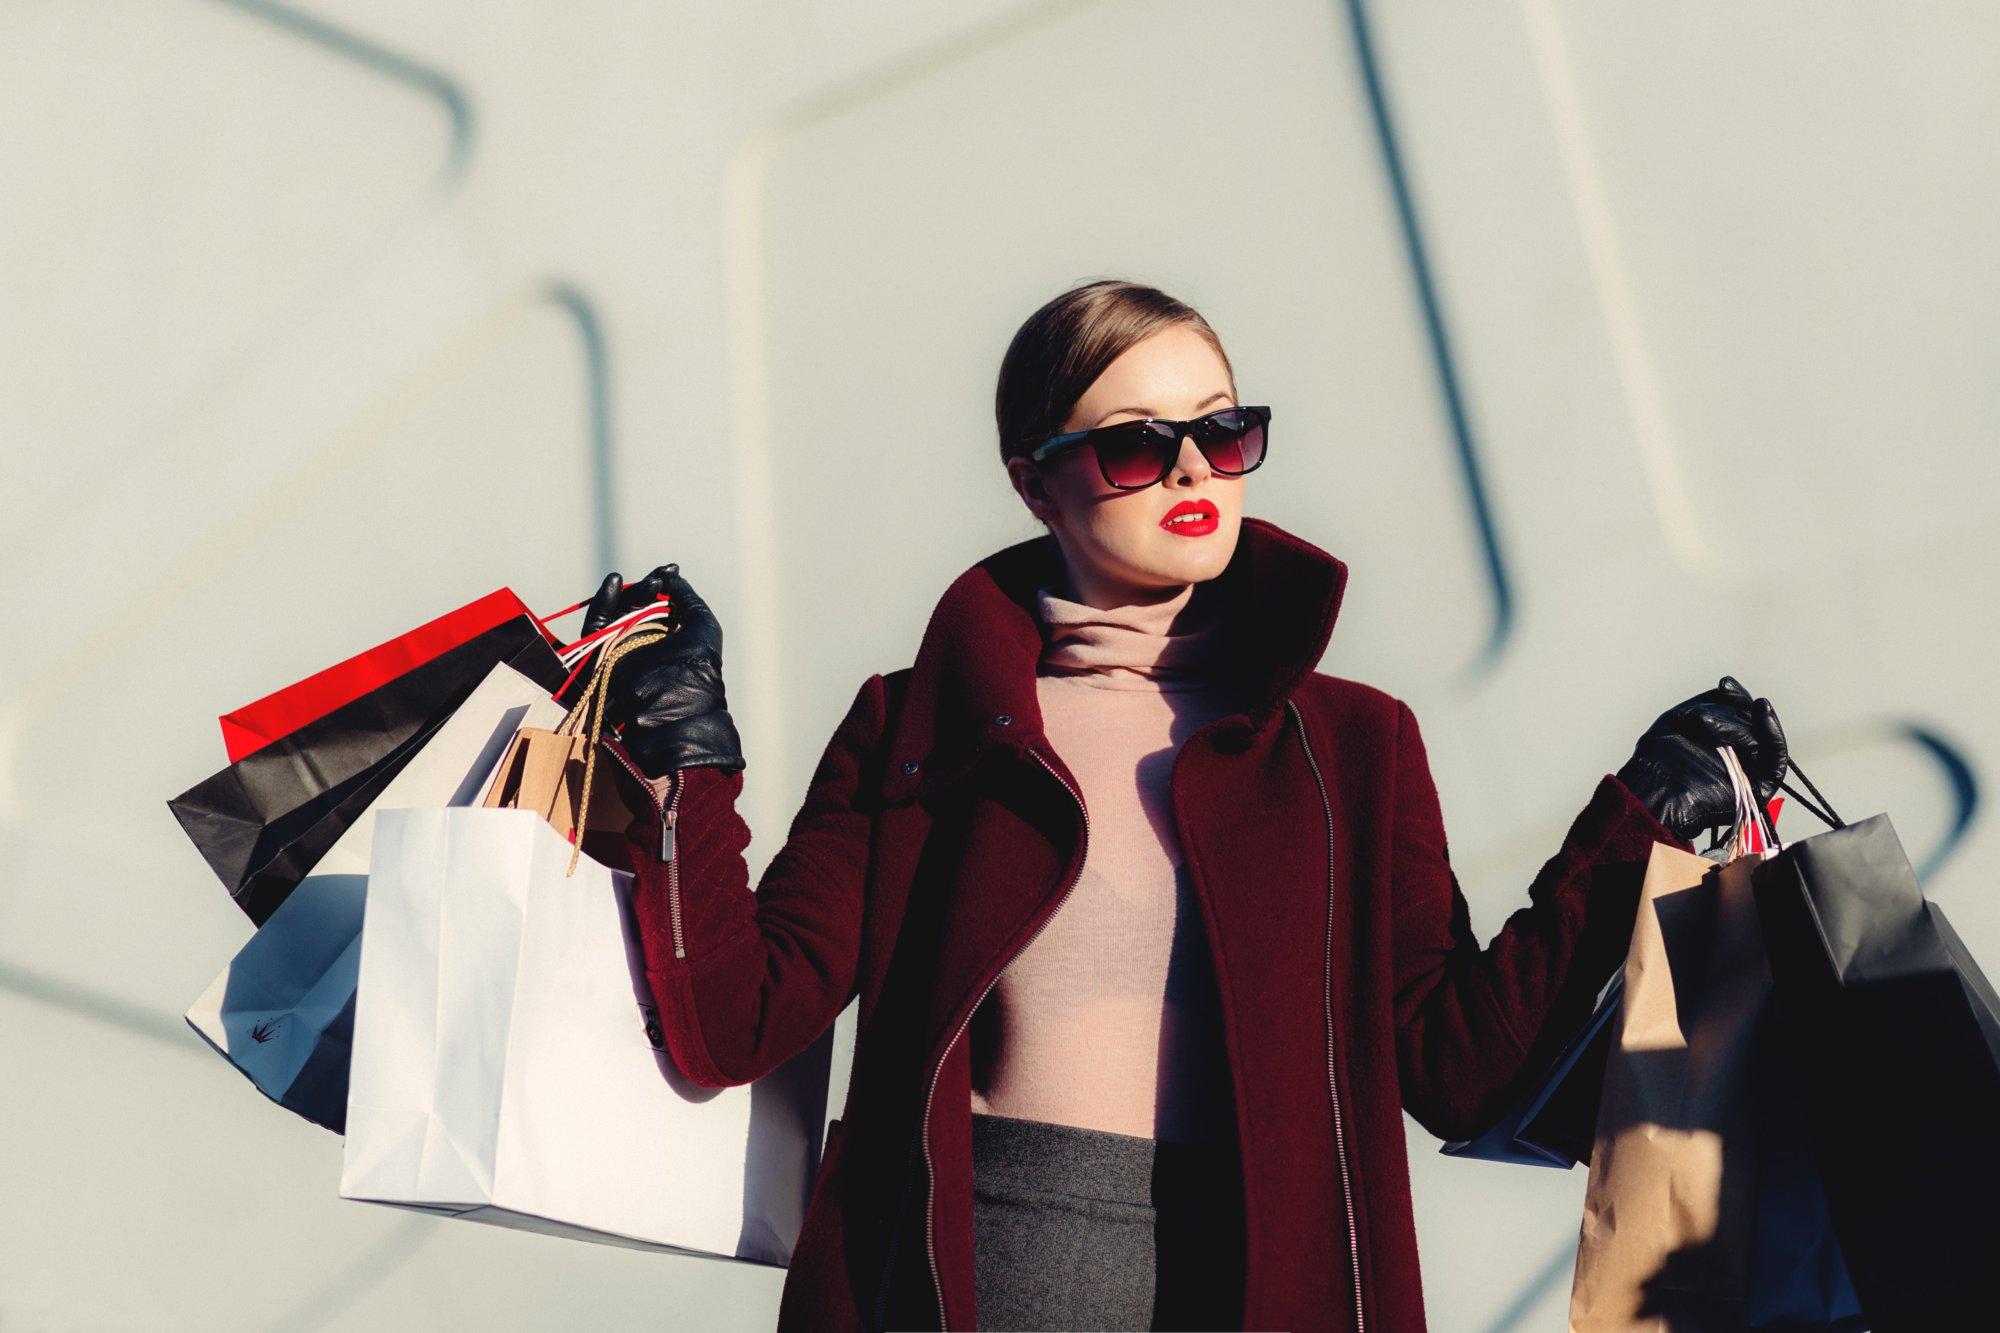 Conheça como o consumidor se comporta e consome na pandemia